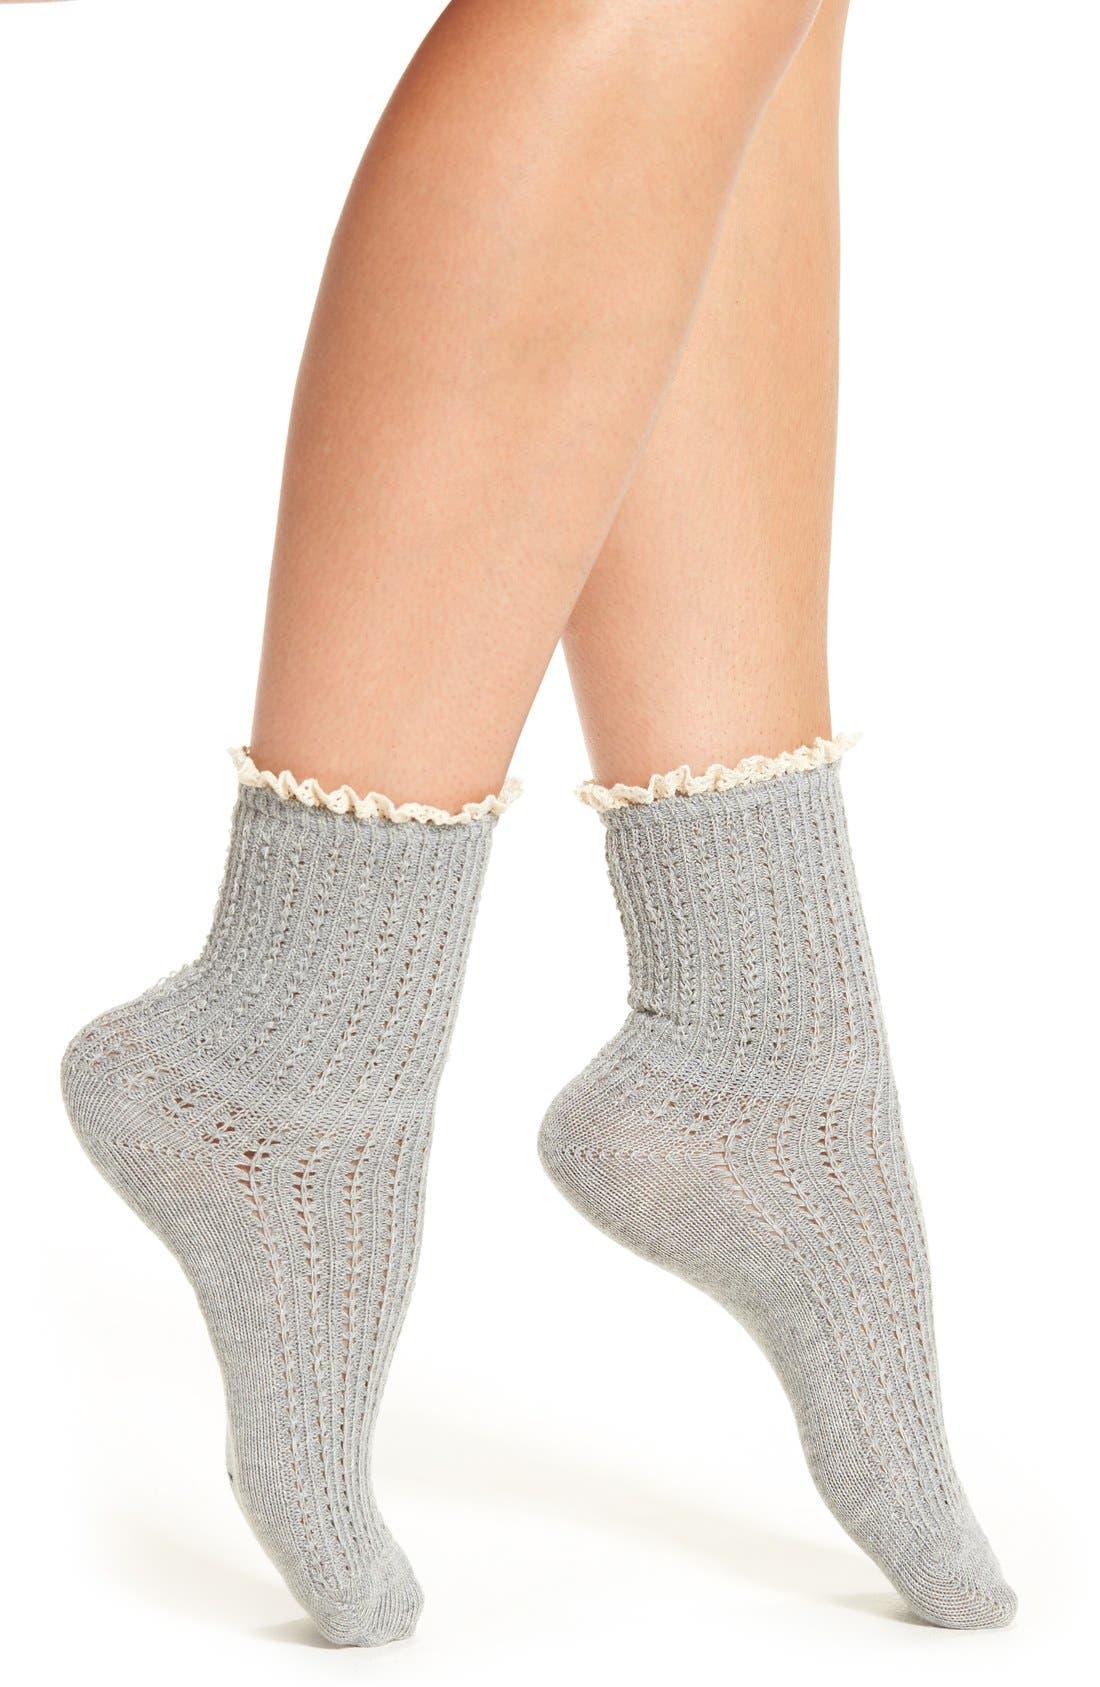 Alternate Image 1 Selected - Peony & Moss Lace TrimCrew Socks